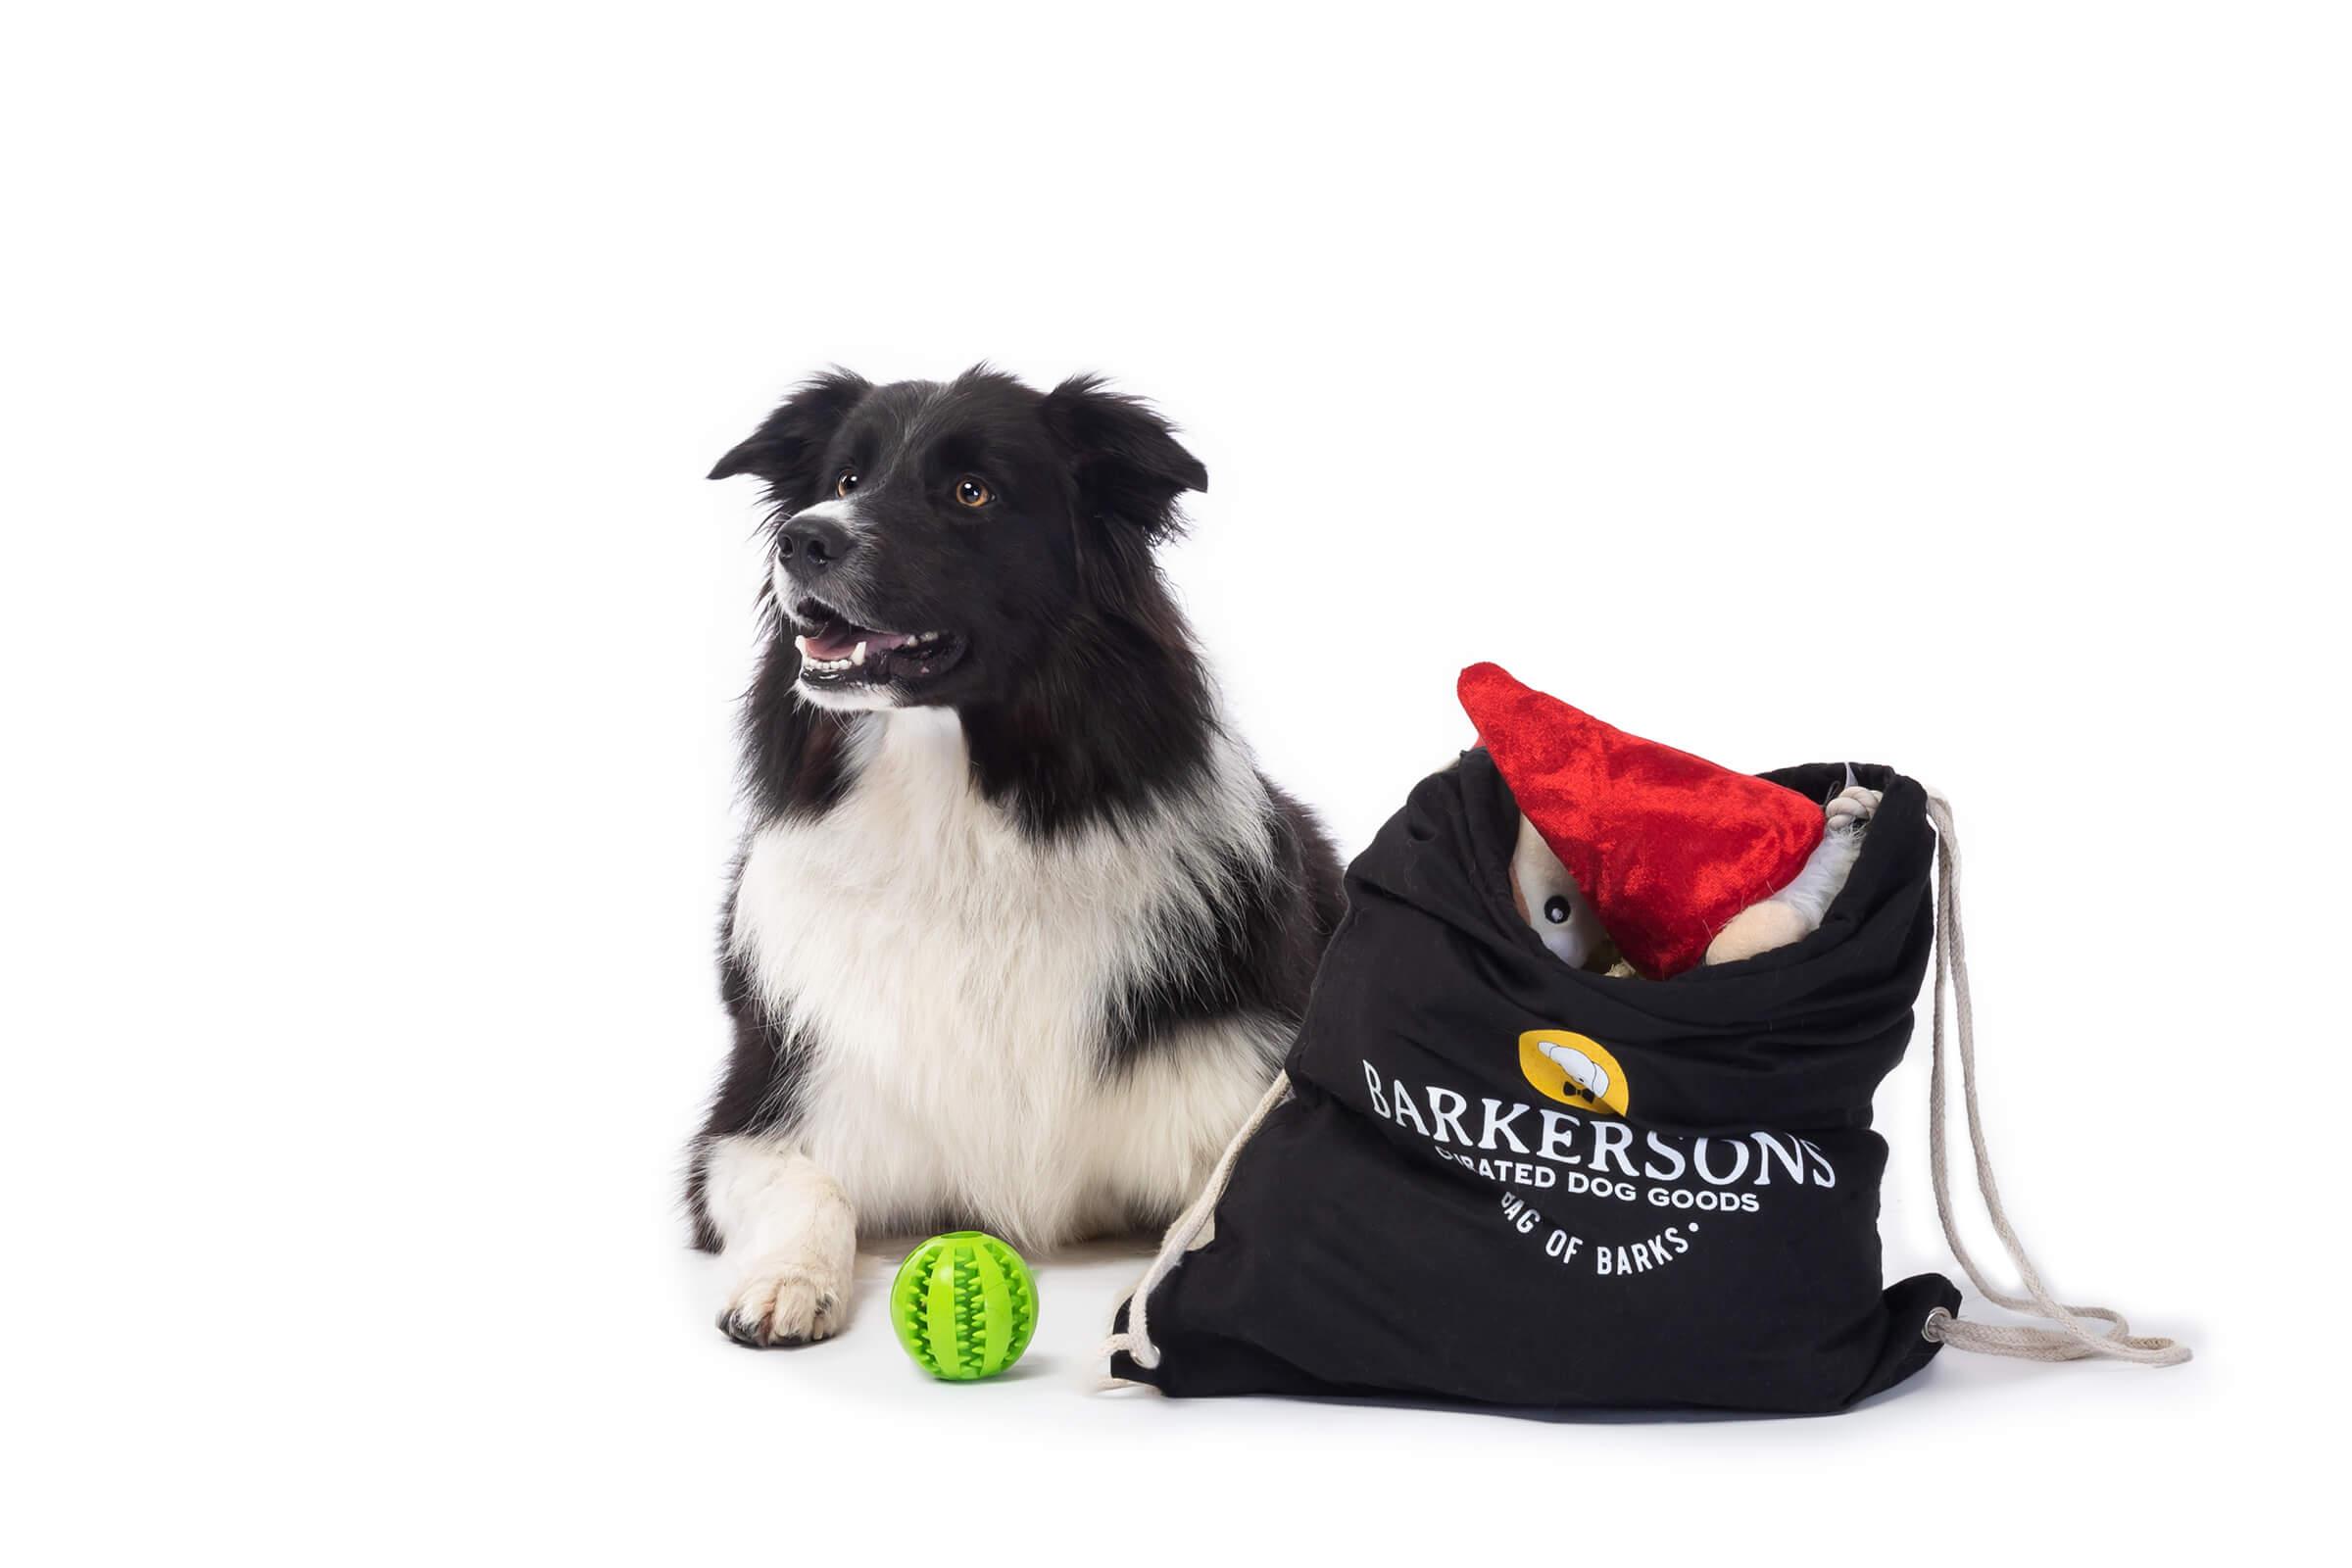 australian shepherd on commecial dog shoot for subscription box